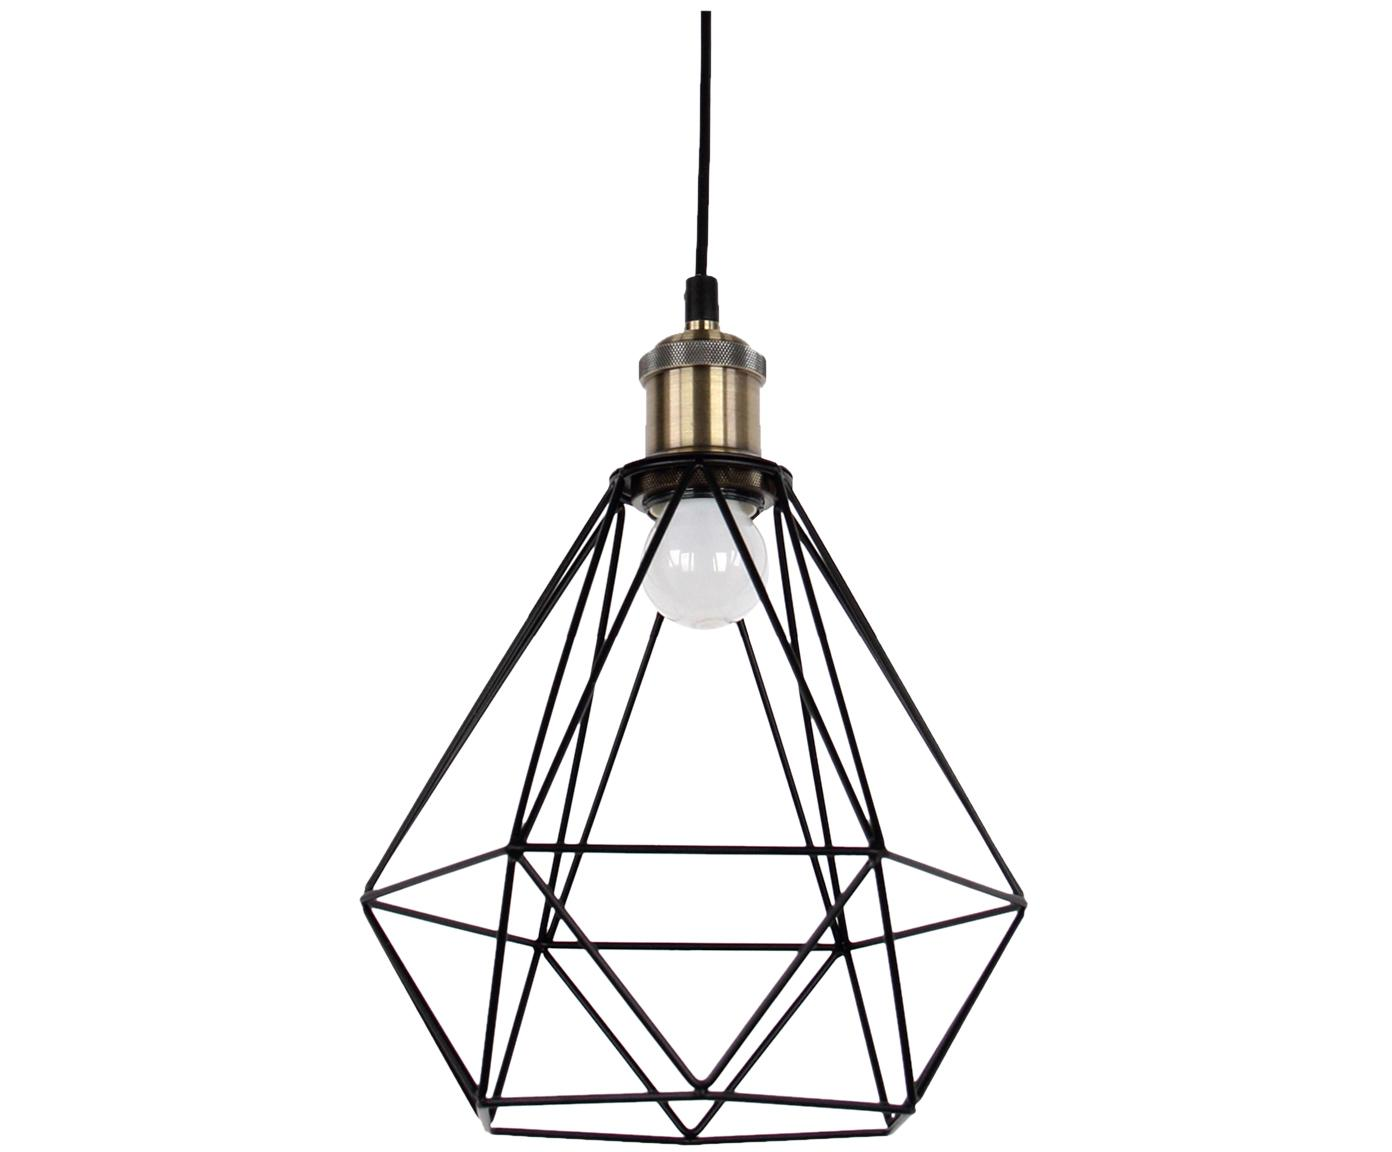 Lámpara de techo Agnes, Anclaje: metal, Pantalla: metal, aluminio, Negro, latón, Ø 21 x Al 22 cm